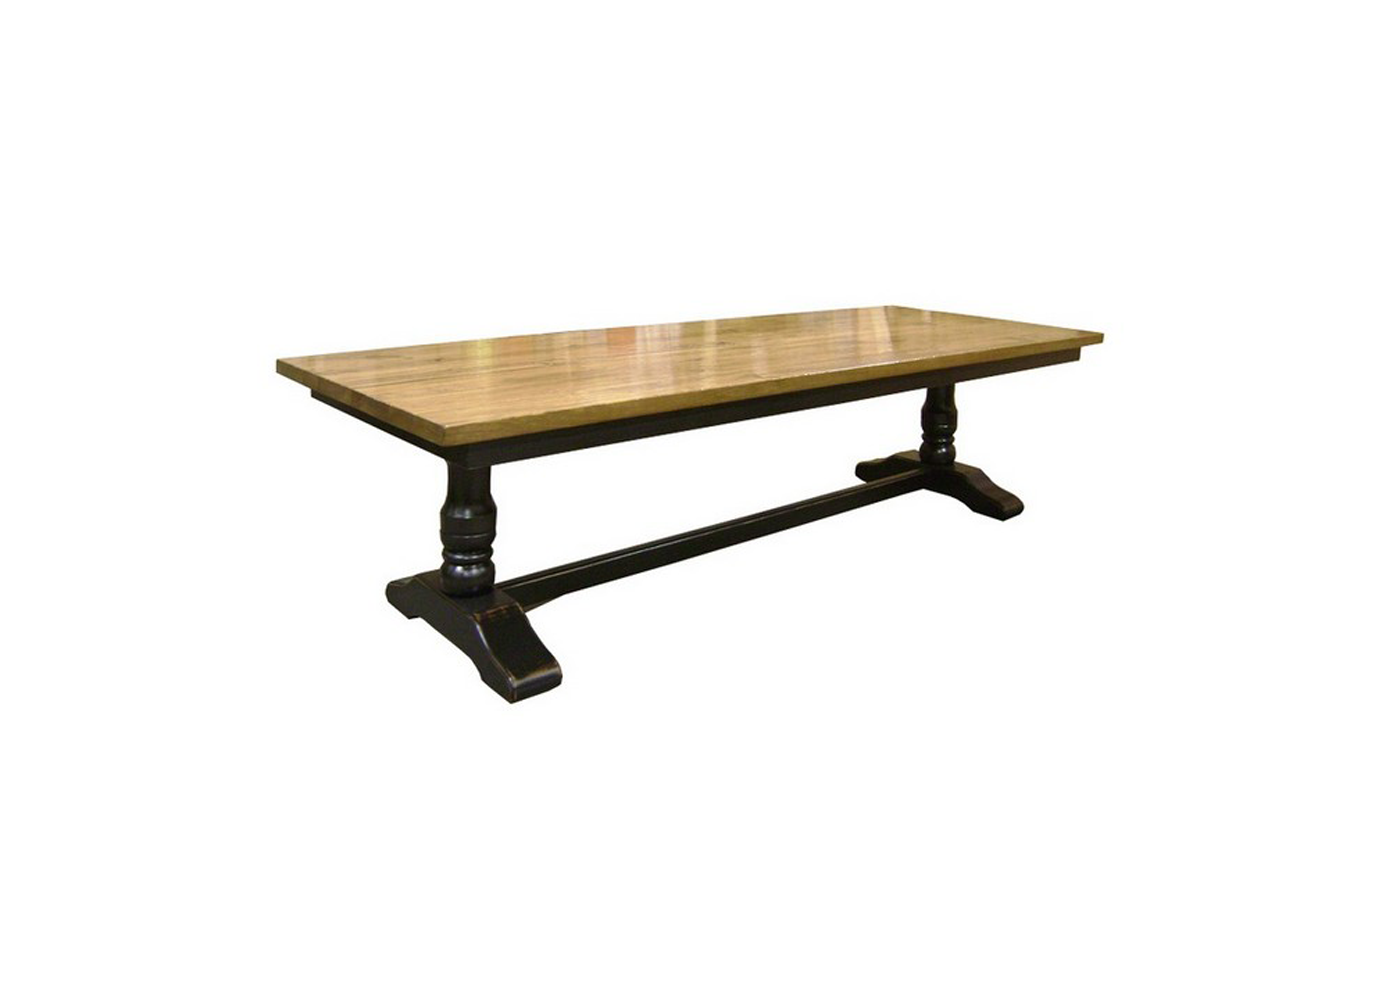 Polanco furniture store ottawa interior decor solutions for Pedestal trestle dining table plans